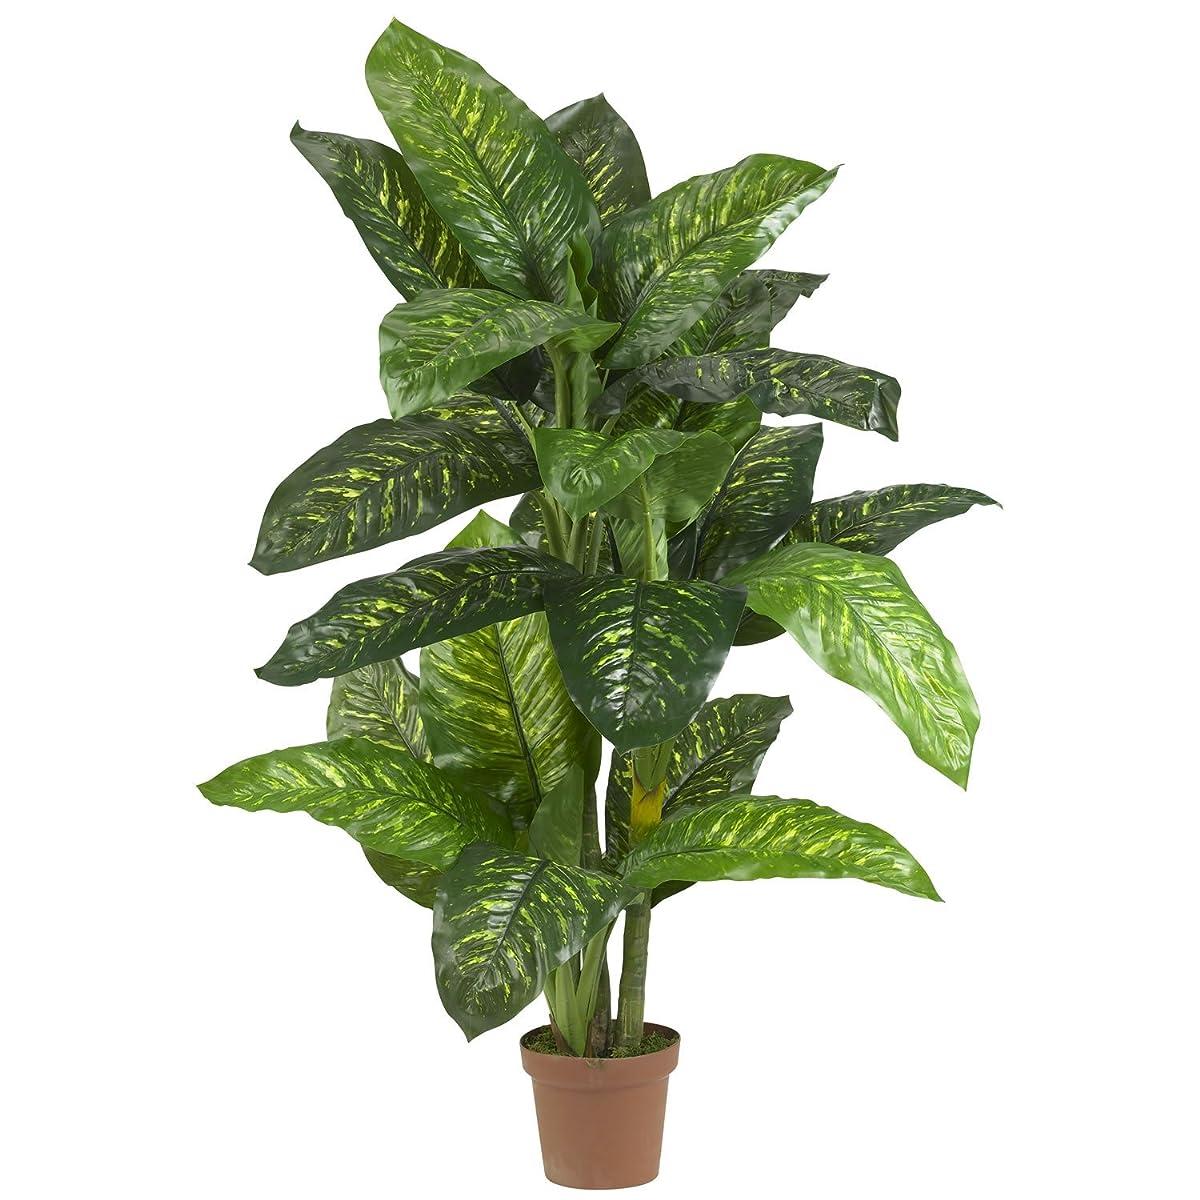 5 Dieffenbachia Silk Plant - (Real Touch)